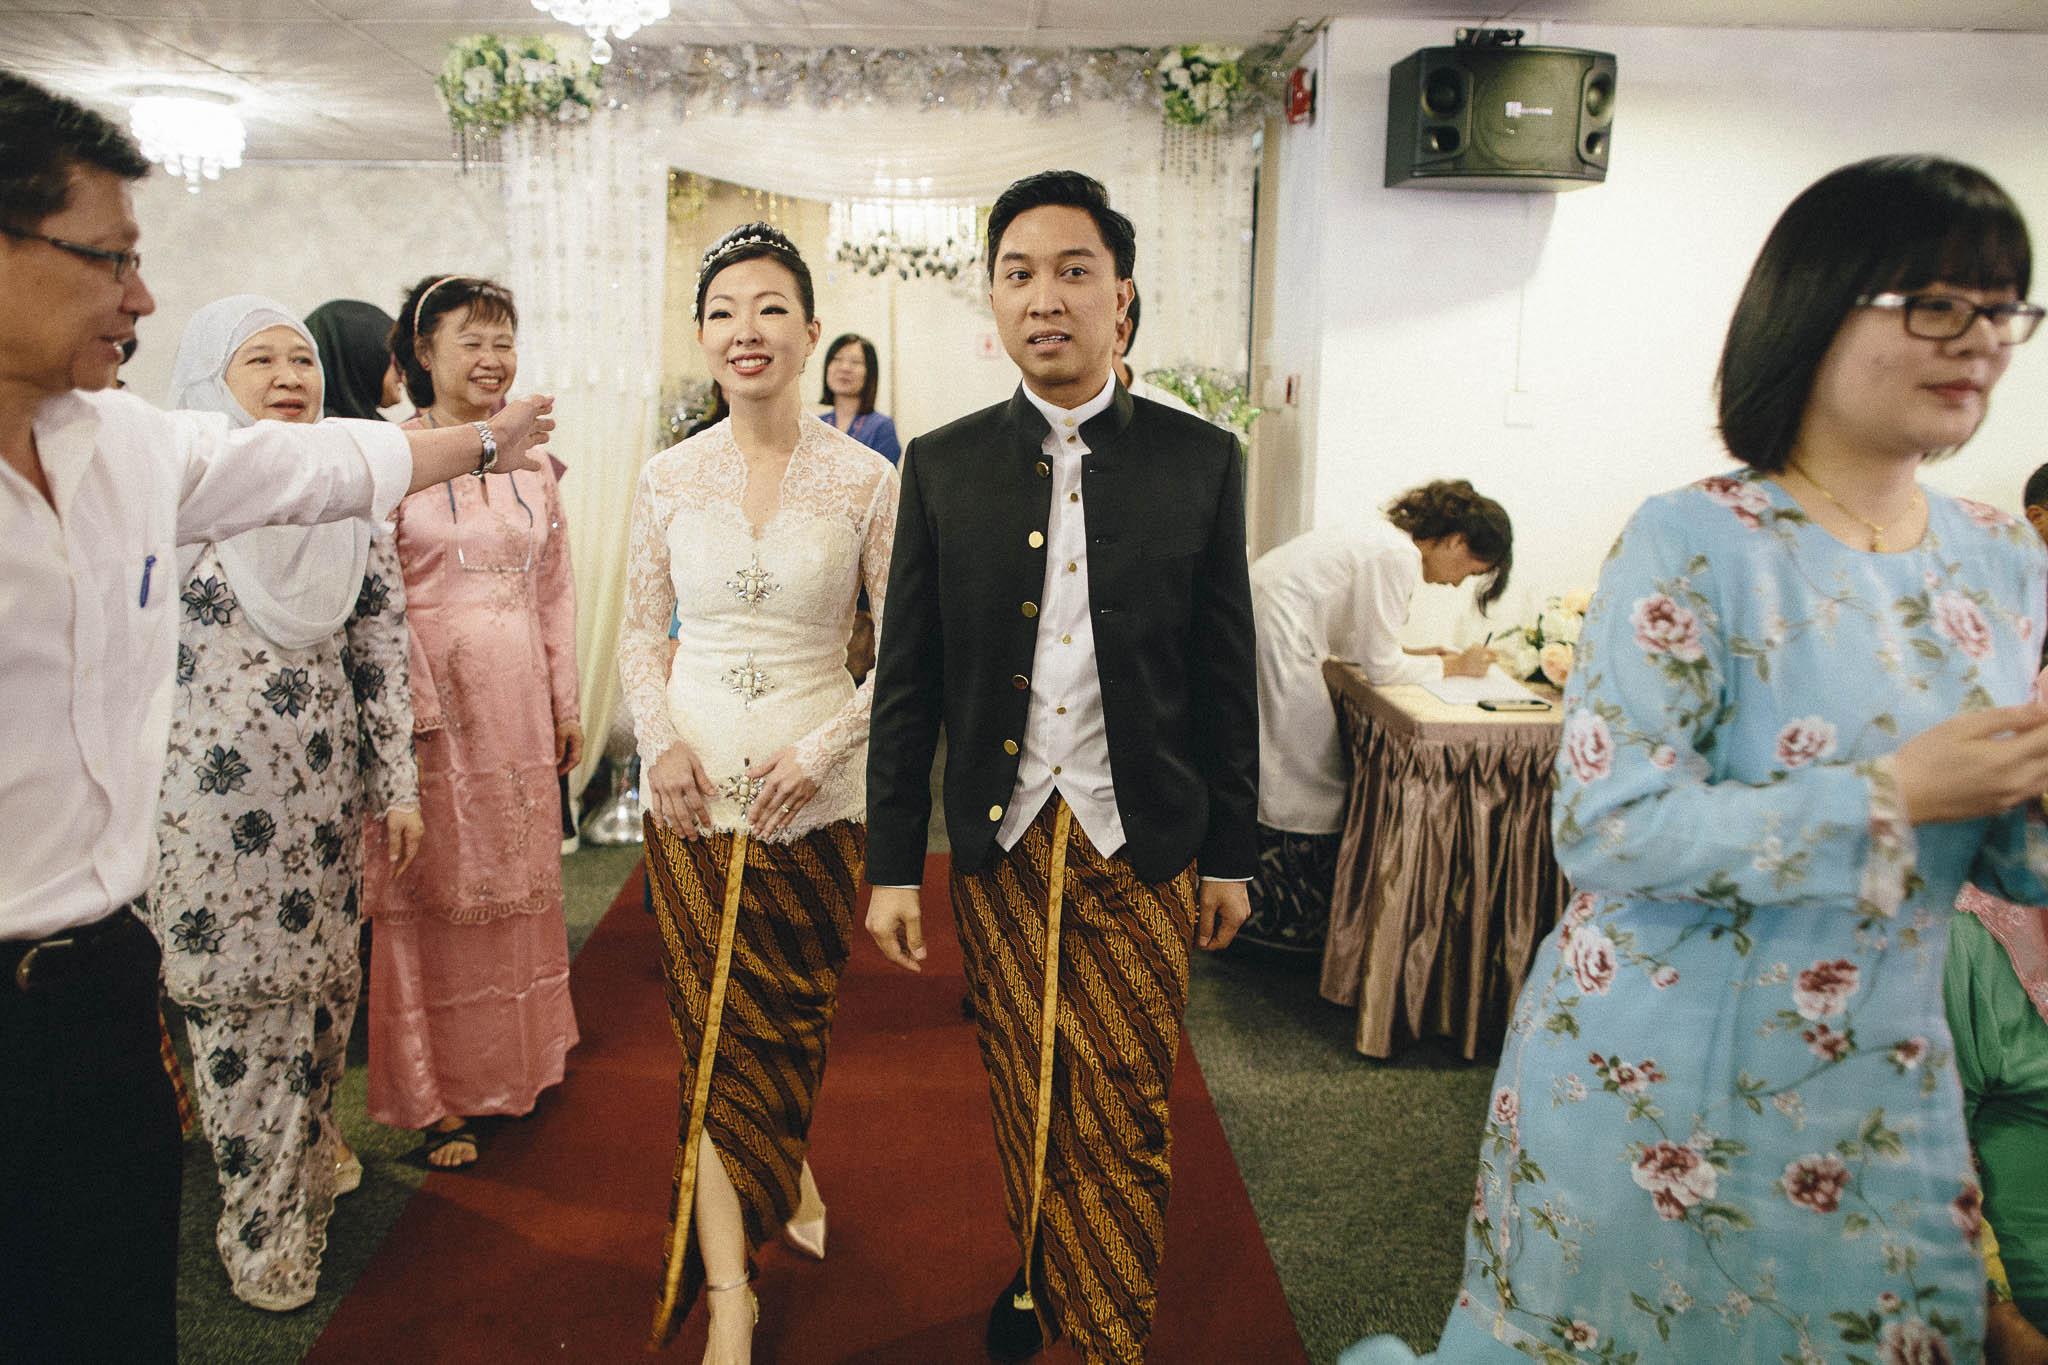 singapore-wedding-photographer-malay-indian-pre-wedding-travel-wmt-2015-62.jpg